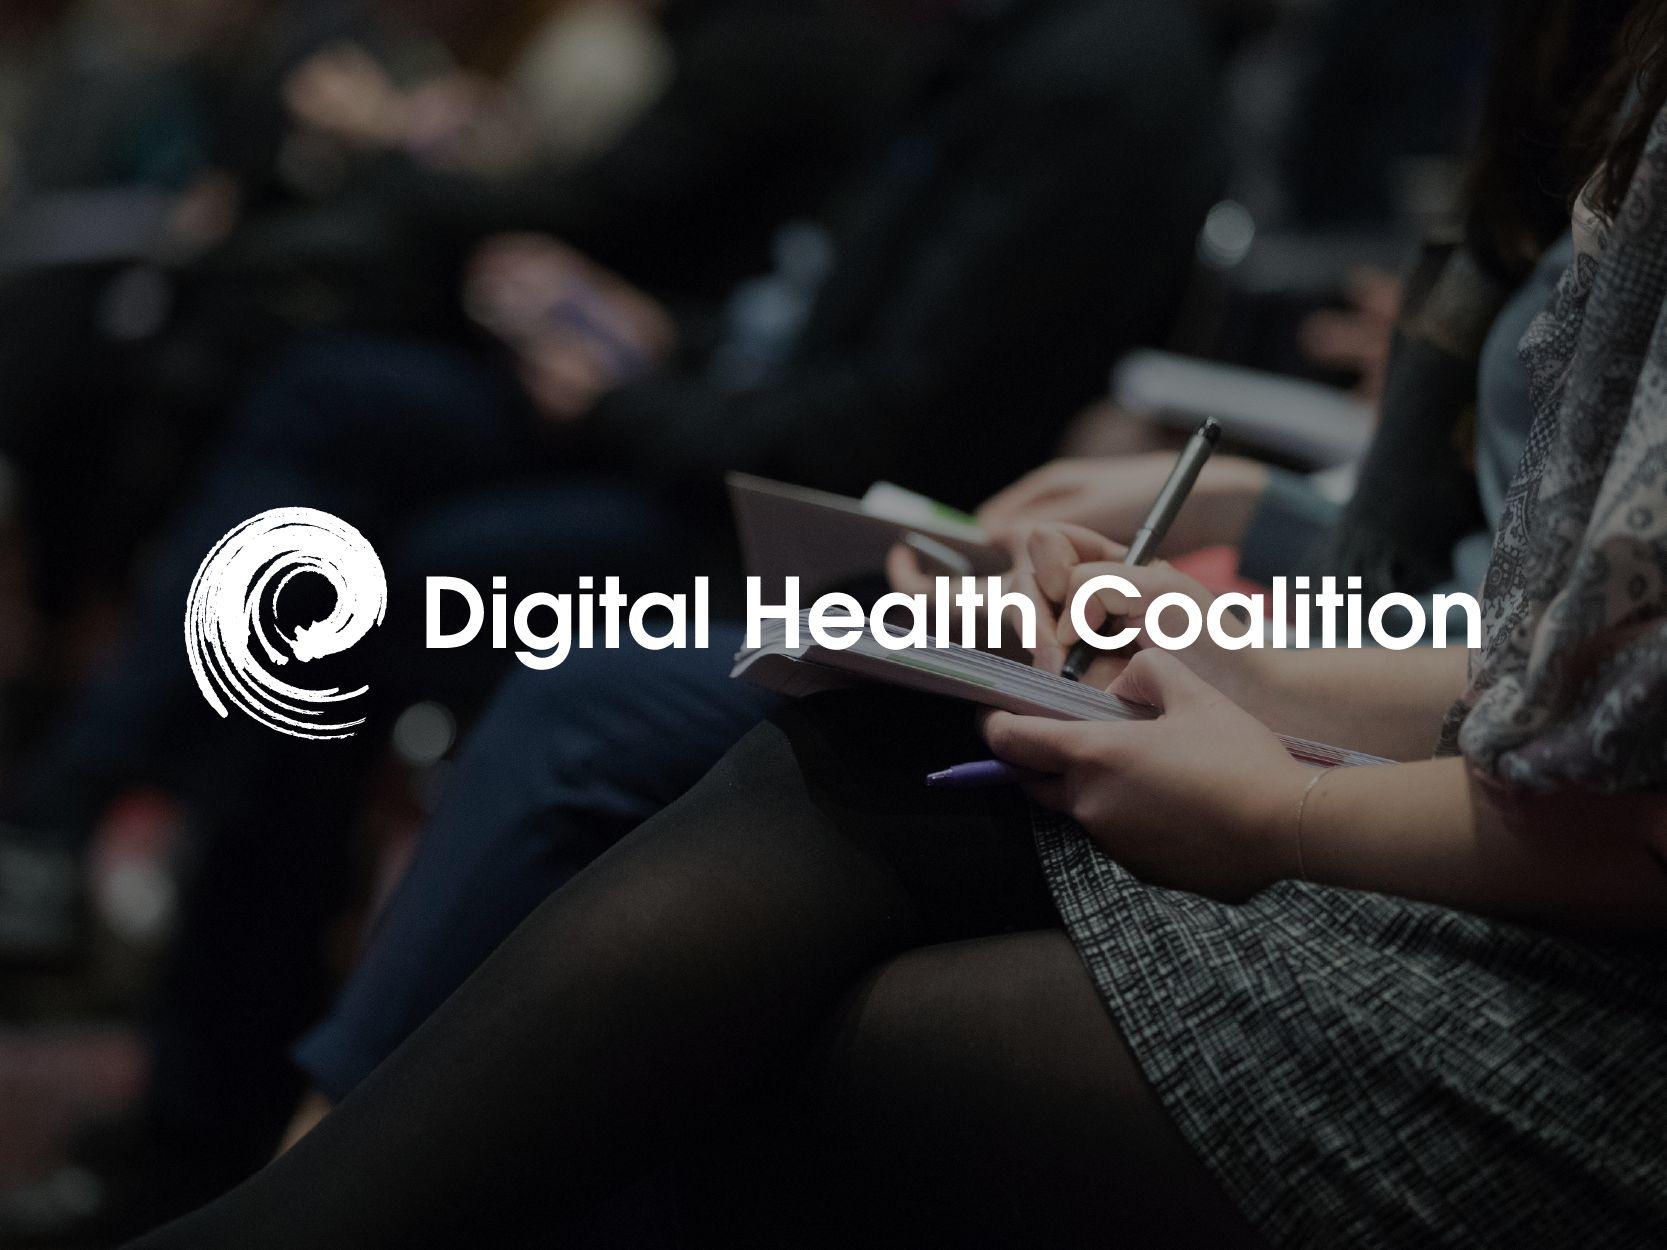 Photo of the Digital Health Coalition logo